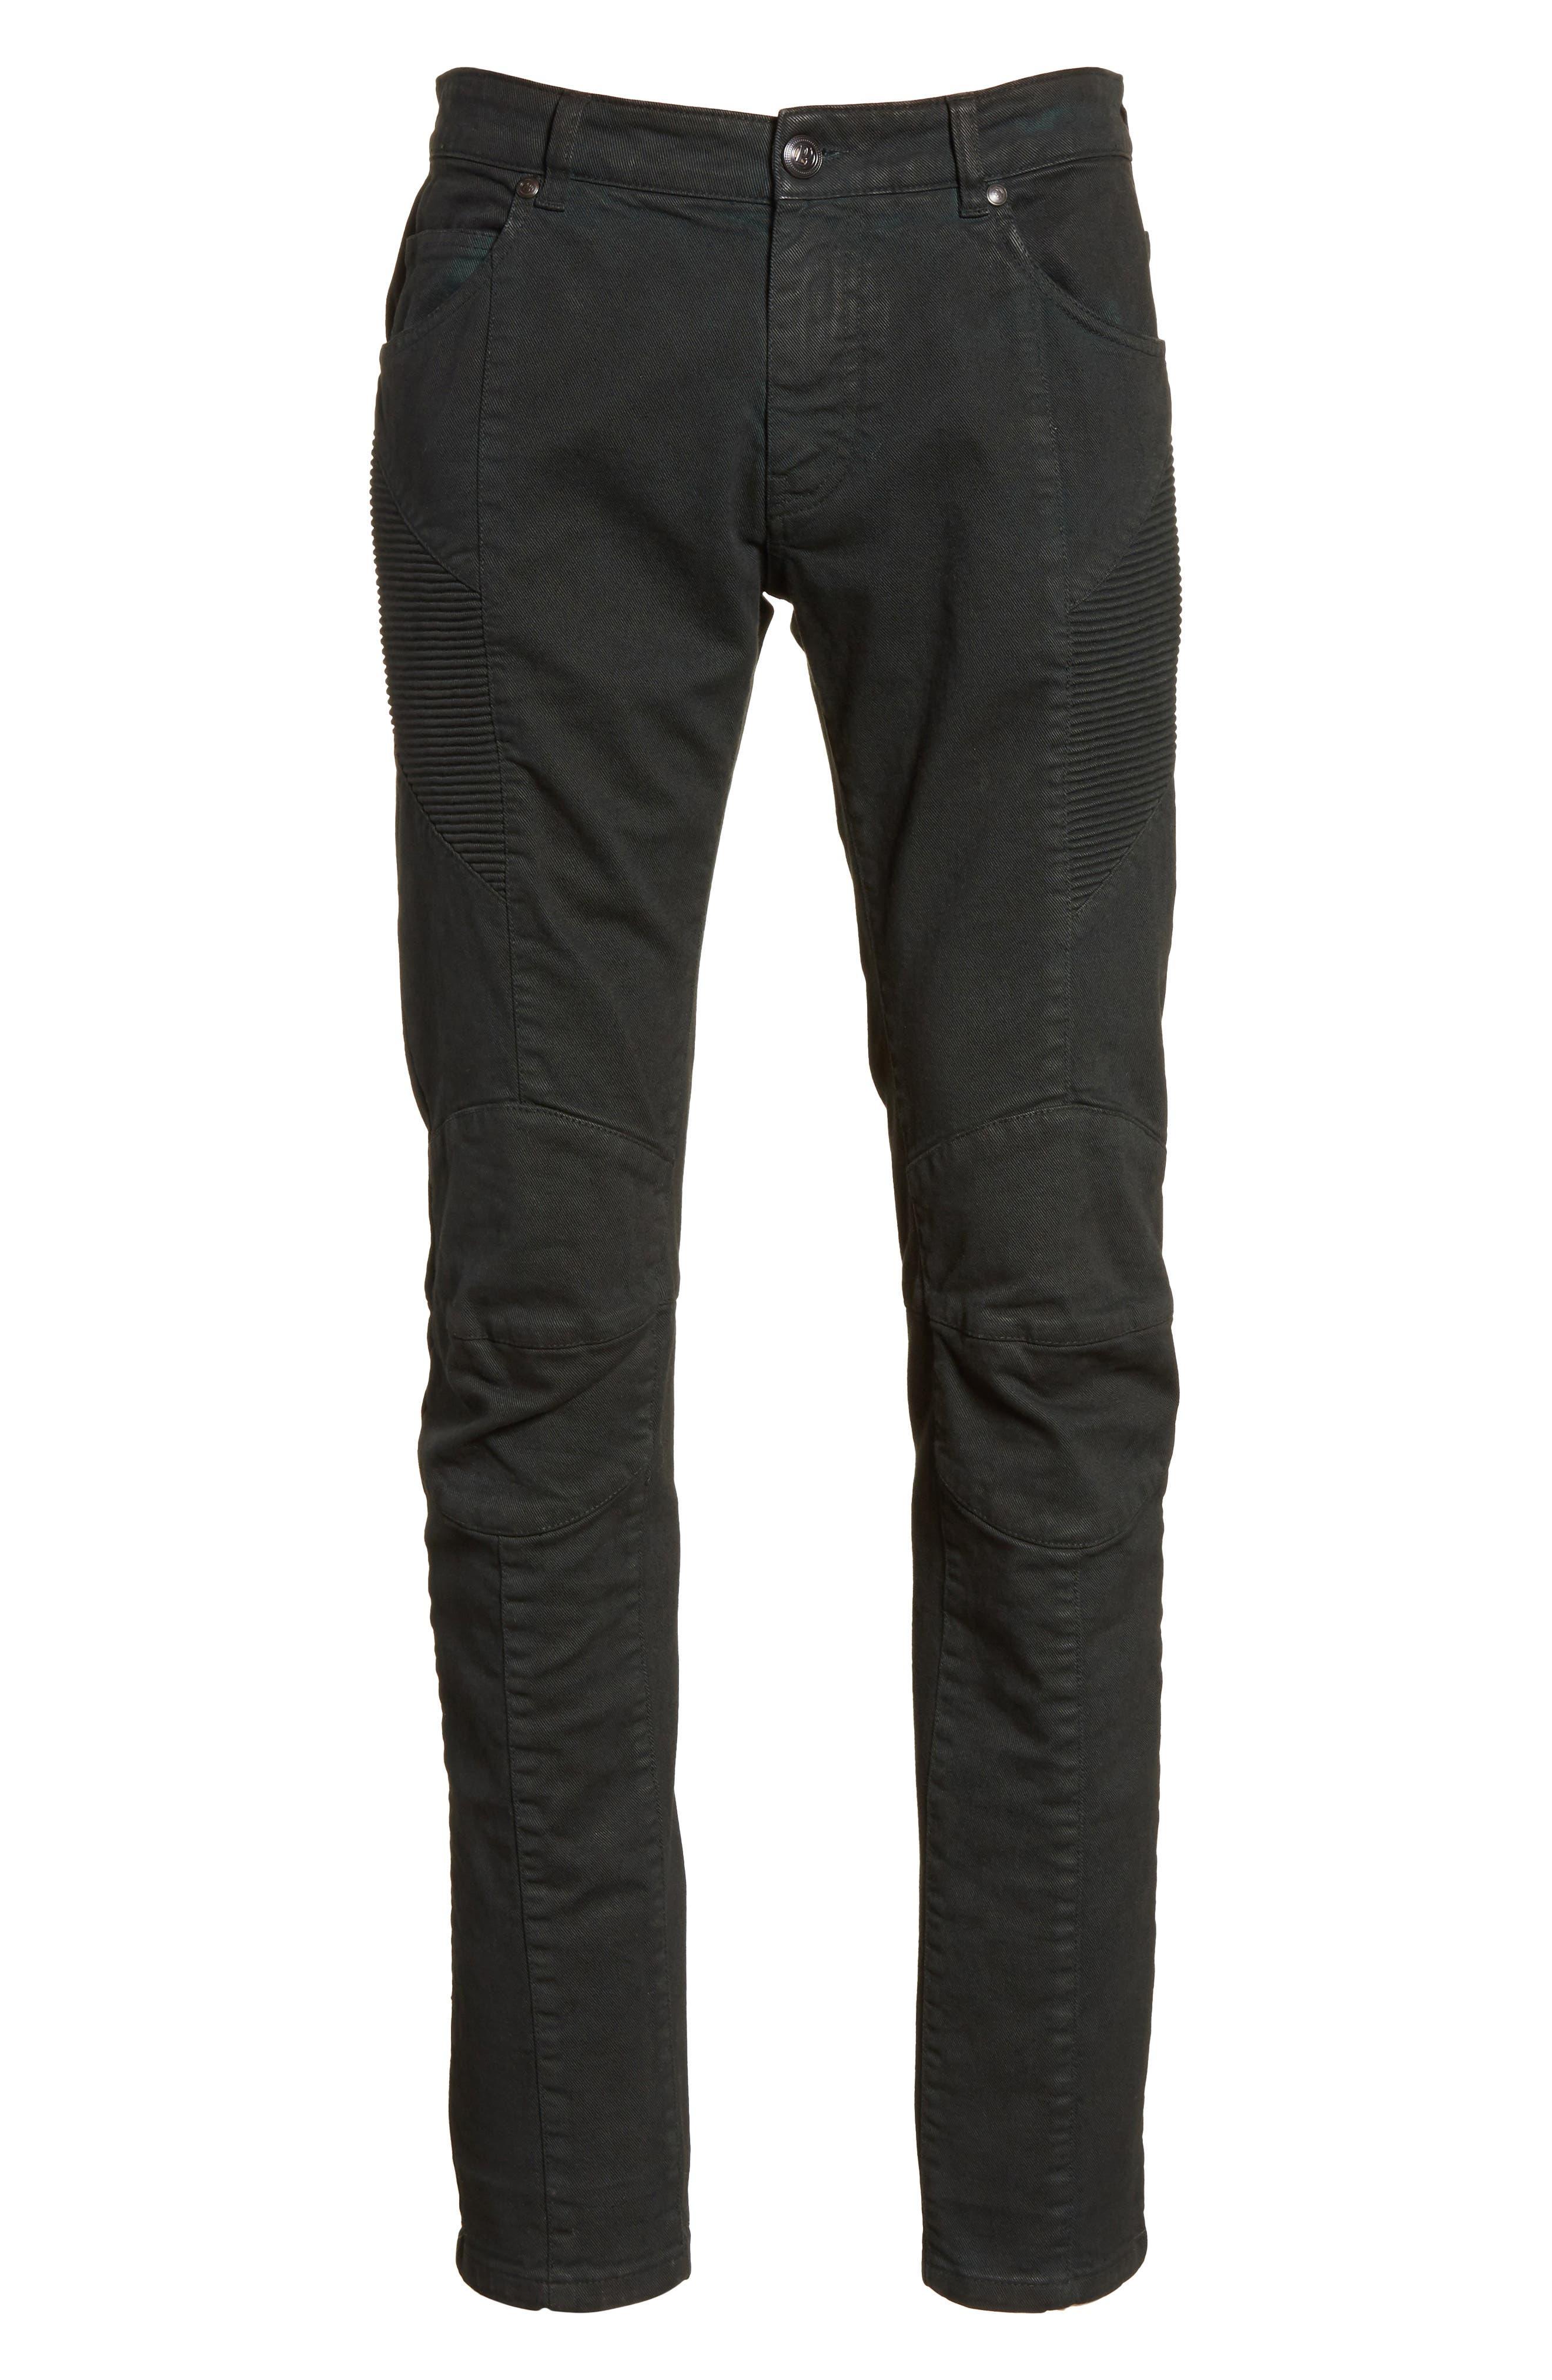 Moto Jeans,                             Alternate thumbnail 6, color,                             Dark Green